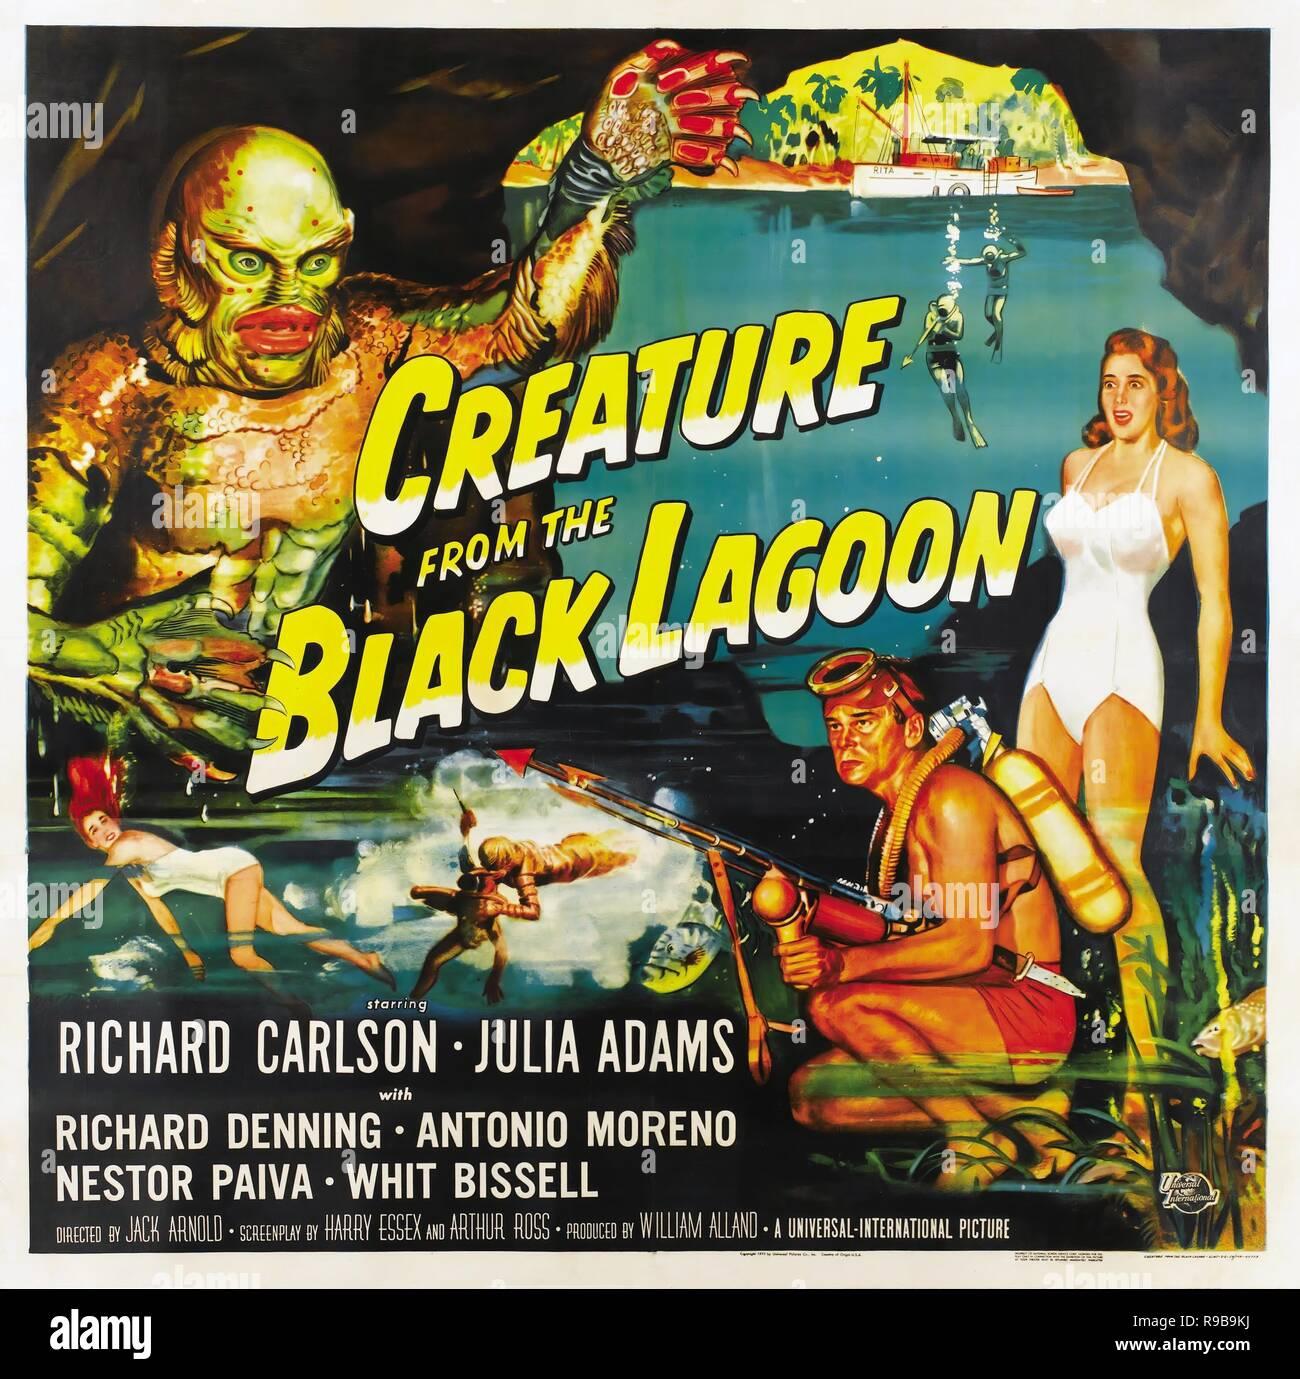 Creature Black Lagoon Poster Stock Photos Creature Black Lagoon